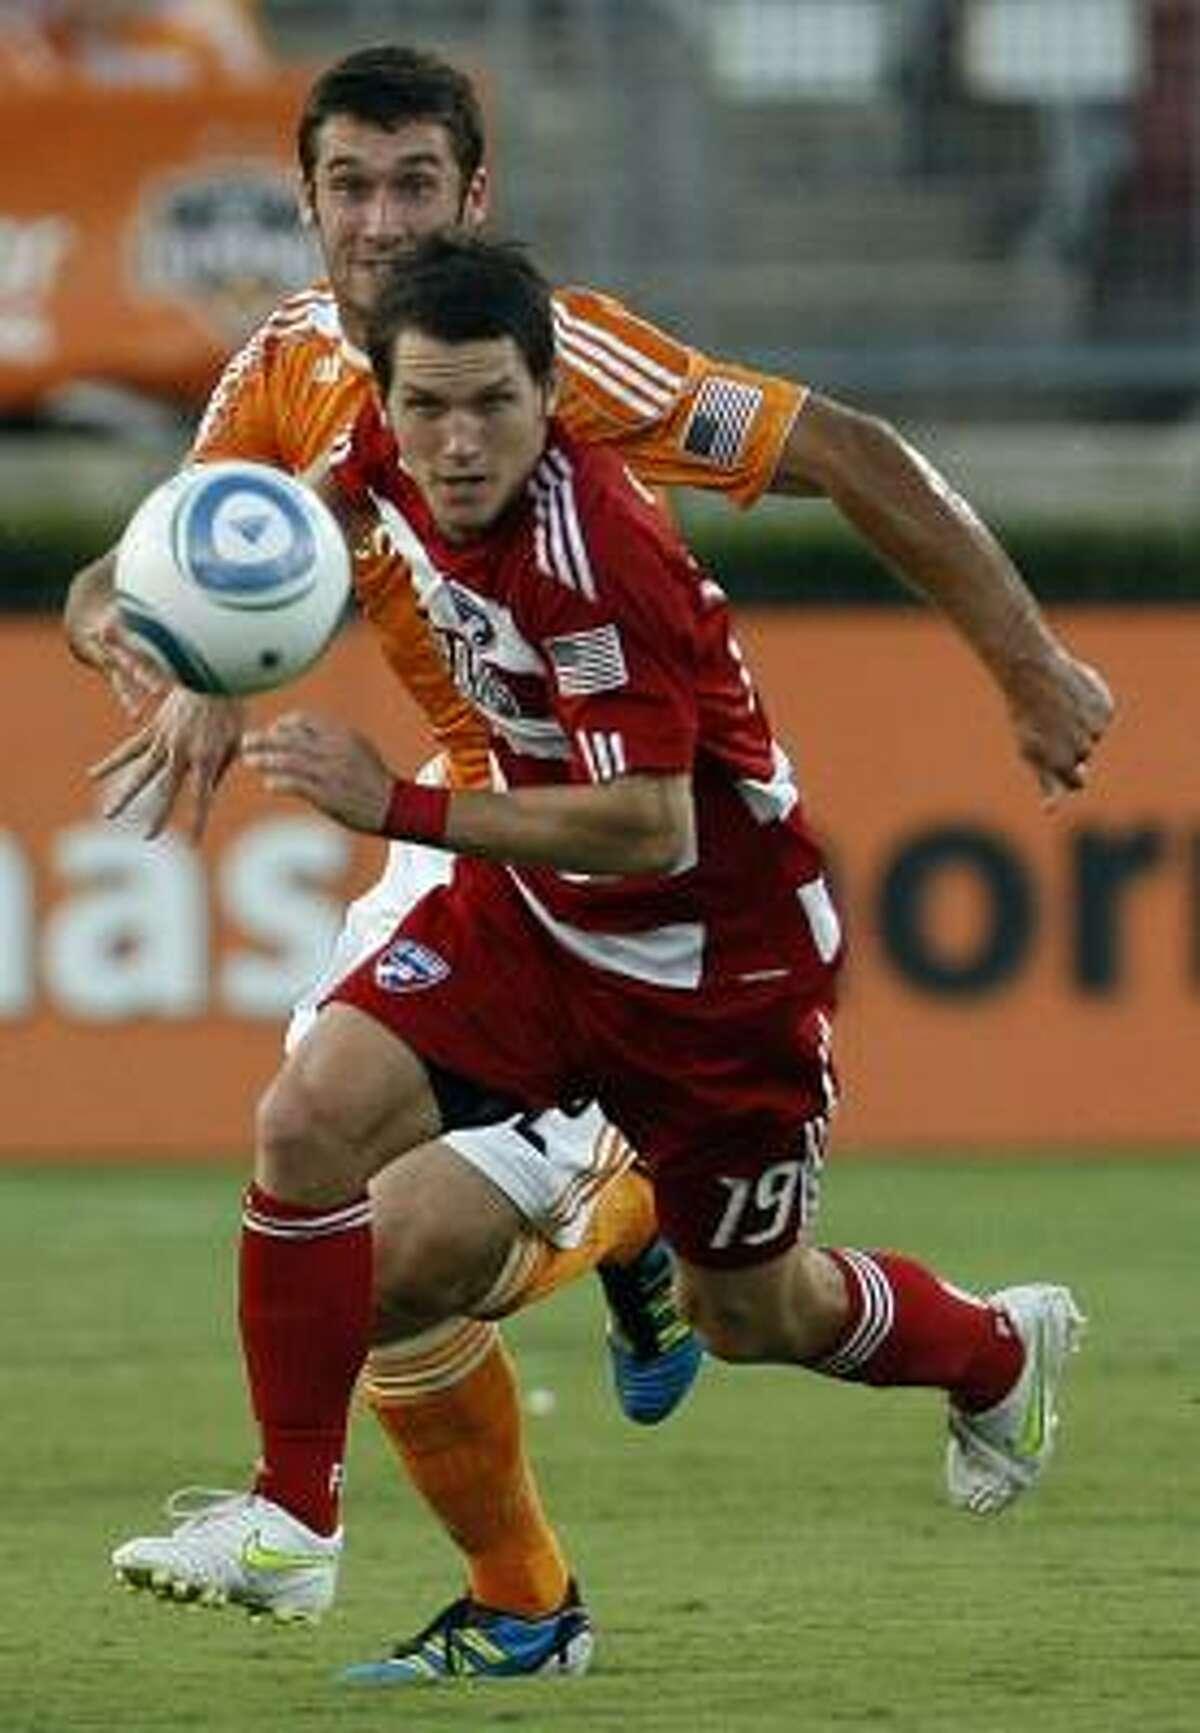 Dynamo forward Will Bruin and FC Dallas defender Zach Loyd battle for the ball.